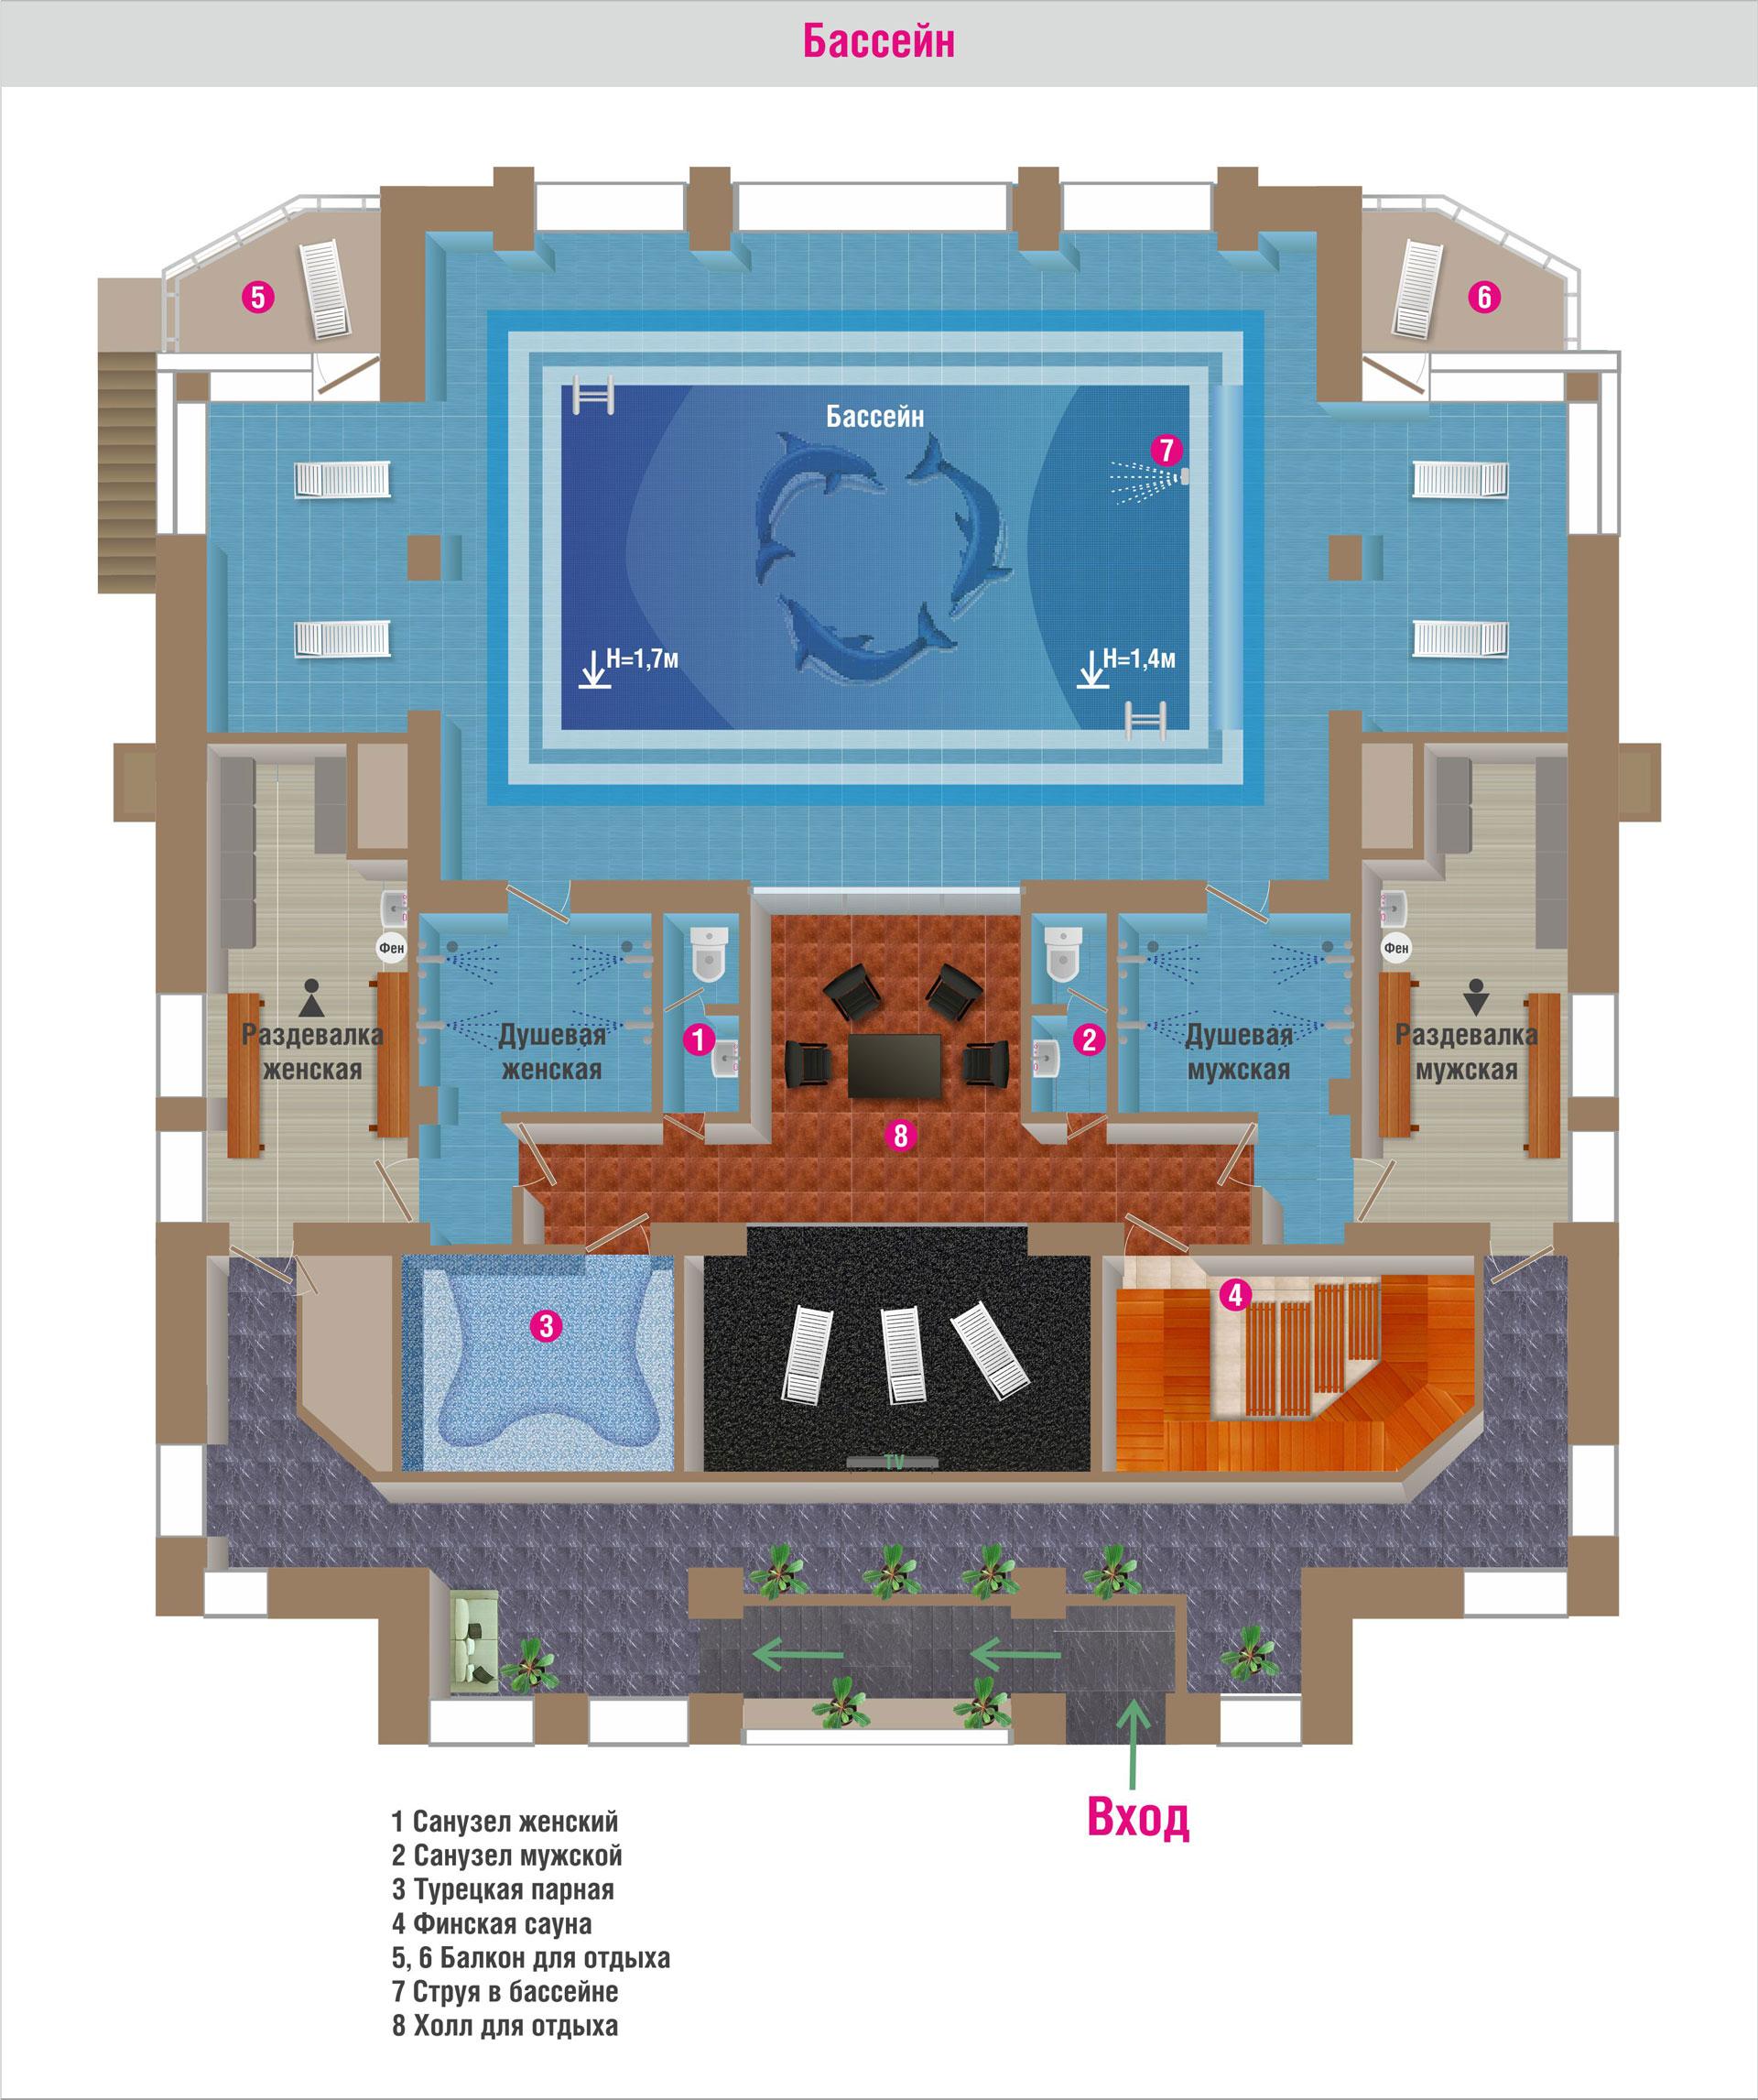 План здания бассейна. База отдыха Розовая дача